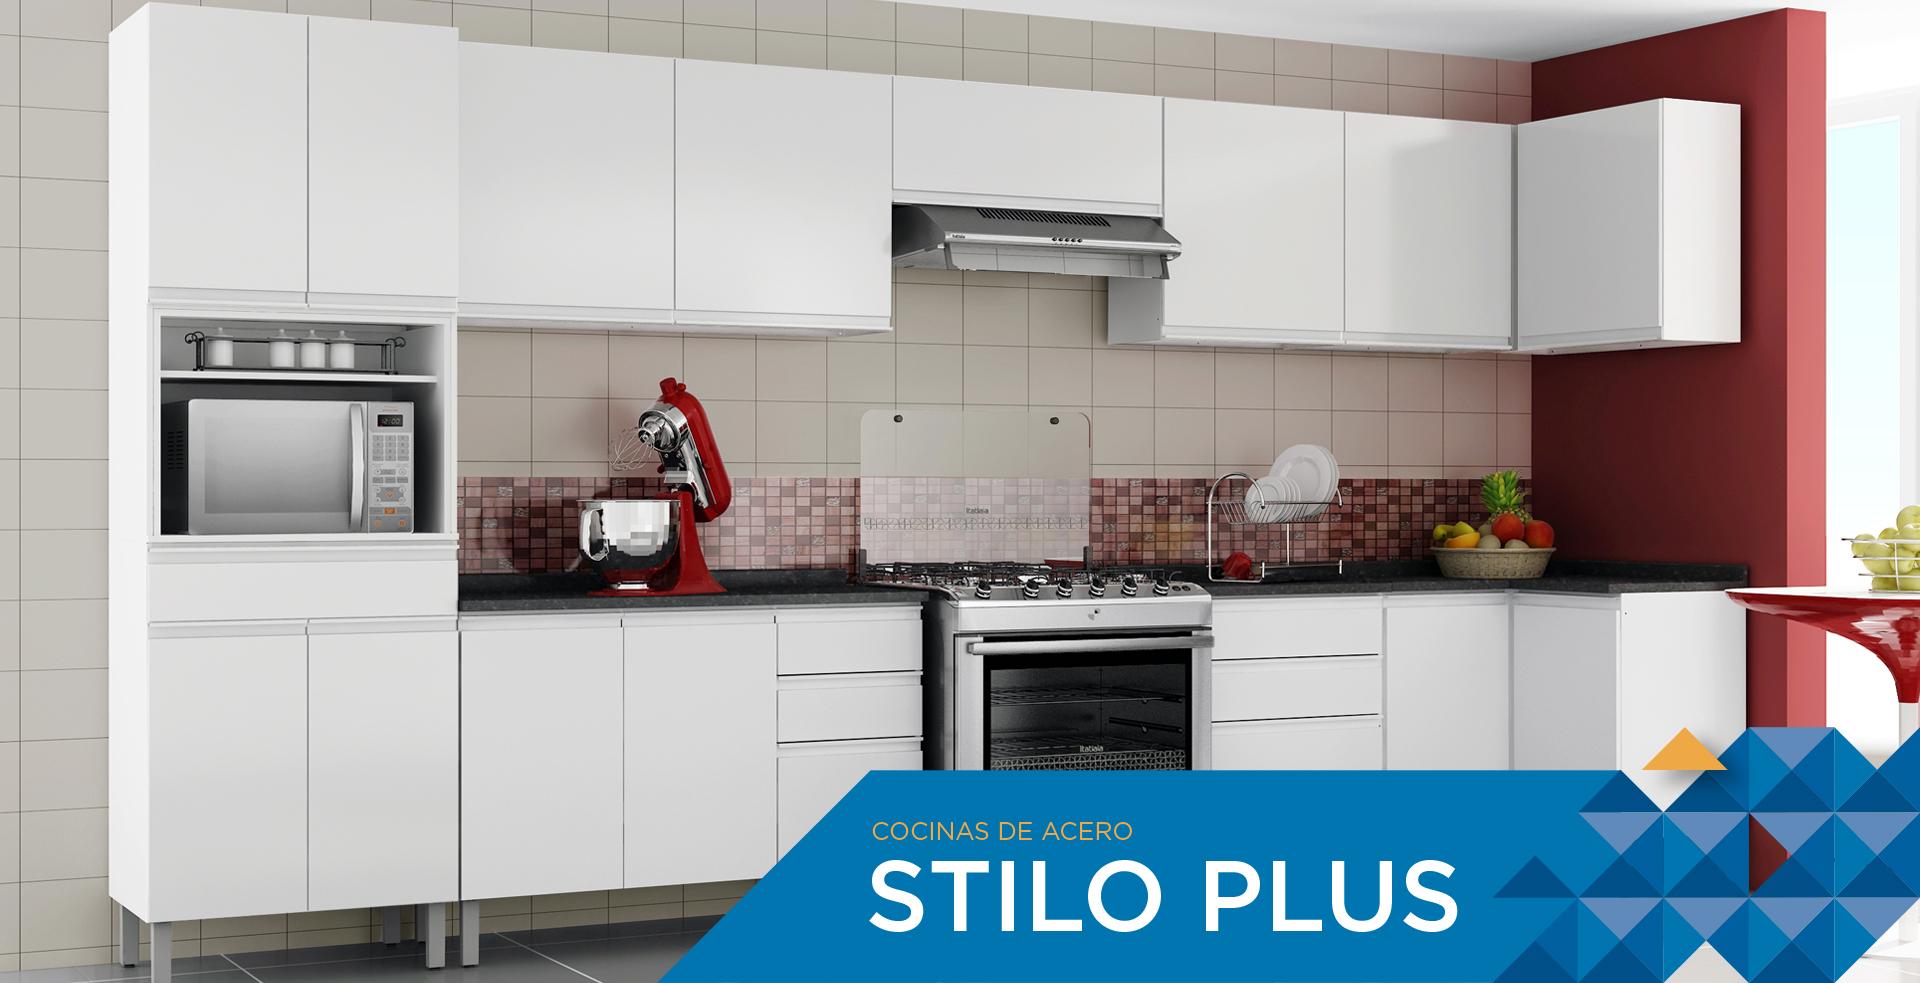 Cocinas de Acero Stilo Plus | Cozinhas Itatiaia